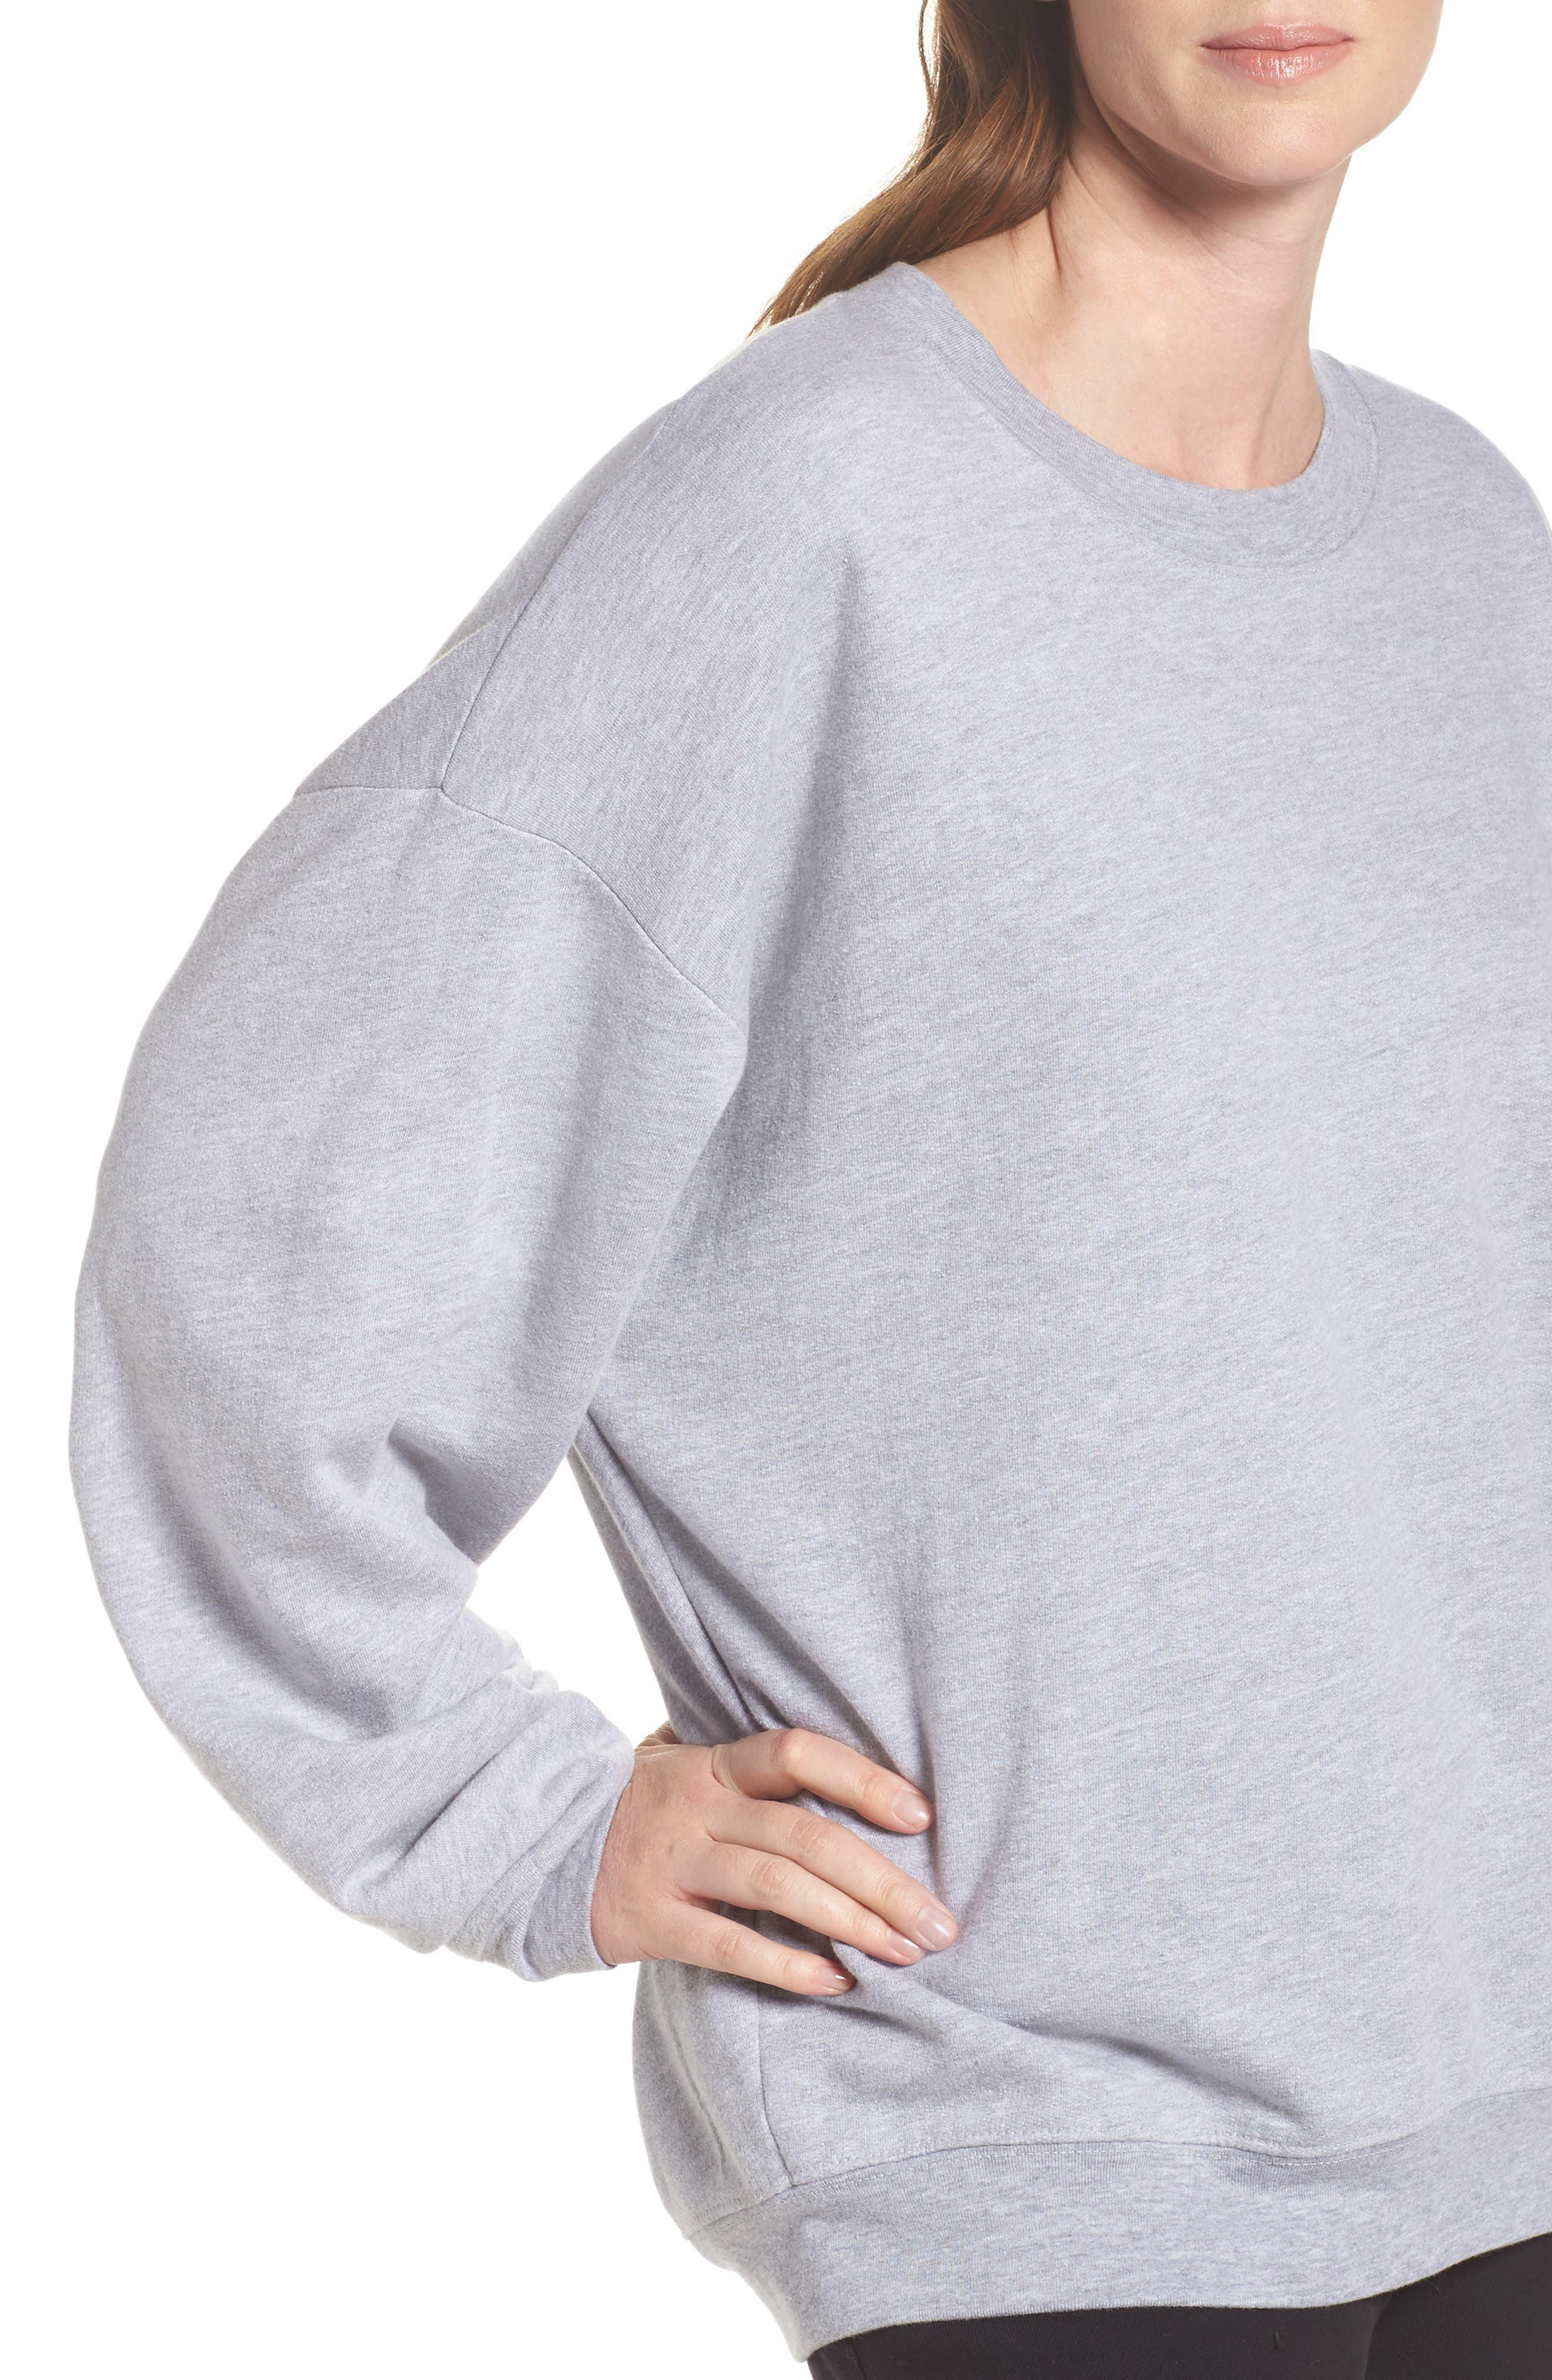 Ellstan Oversize Boyfriend Sweatshirt,                             Alternate thumbnail 4, color,                             035